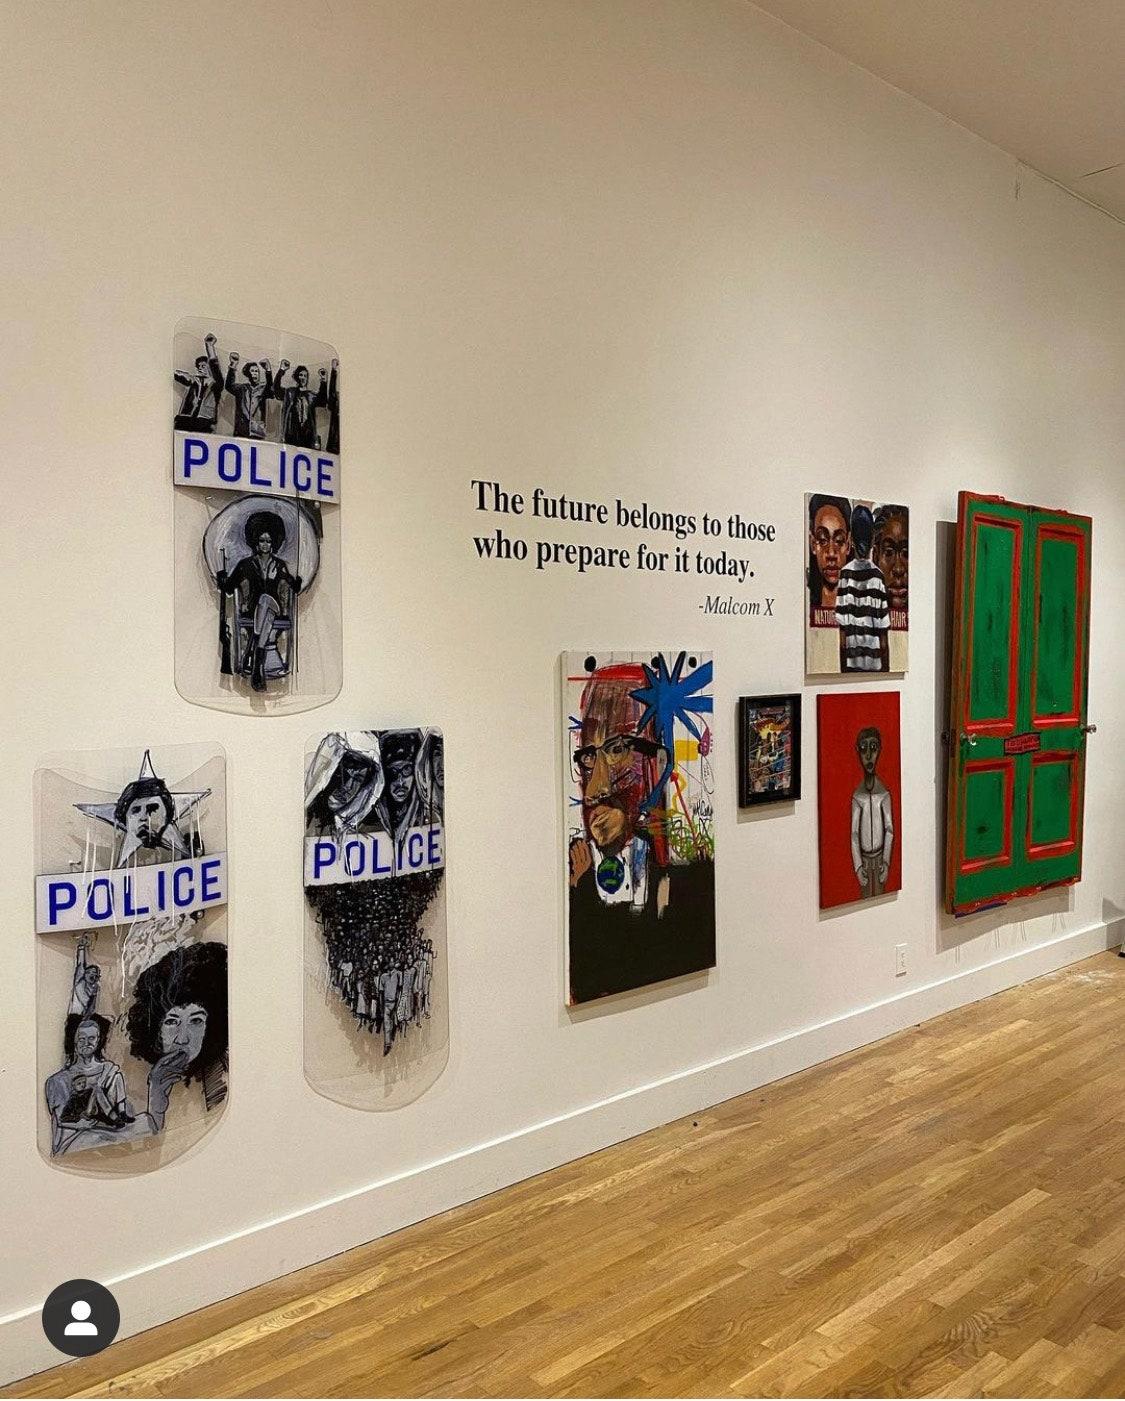 A recent art instillation Barriers held in New York